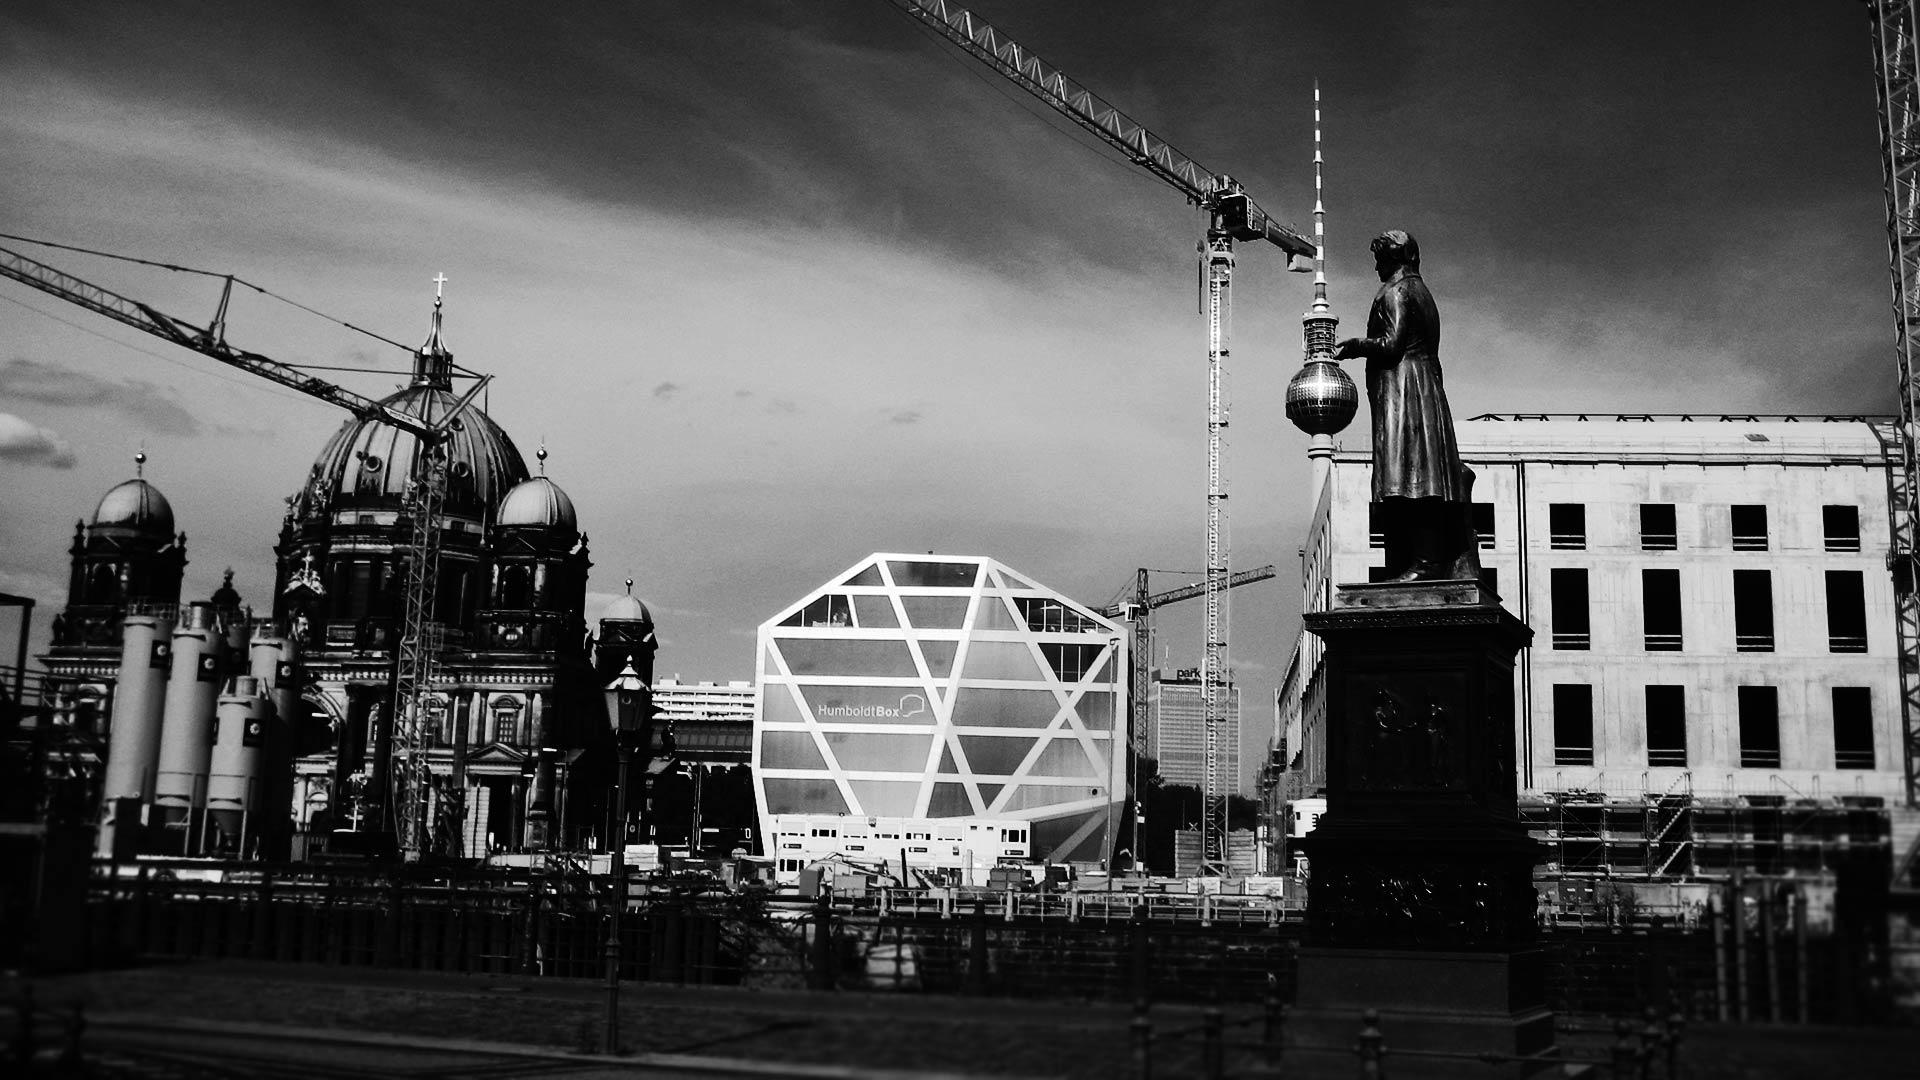 HUMBOLDTBOX - Fotoschau Gitti Scharfenberg DeWo Werbeagentur #5